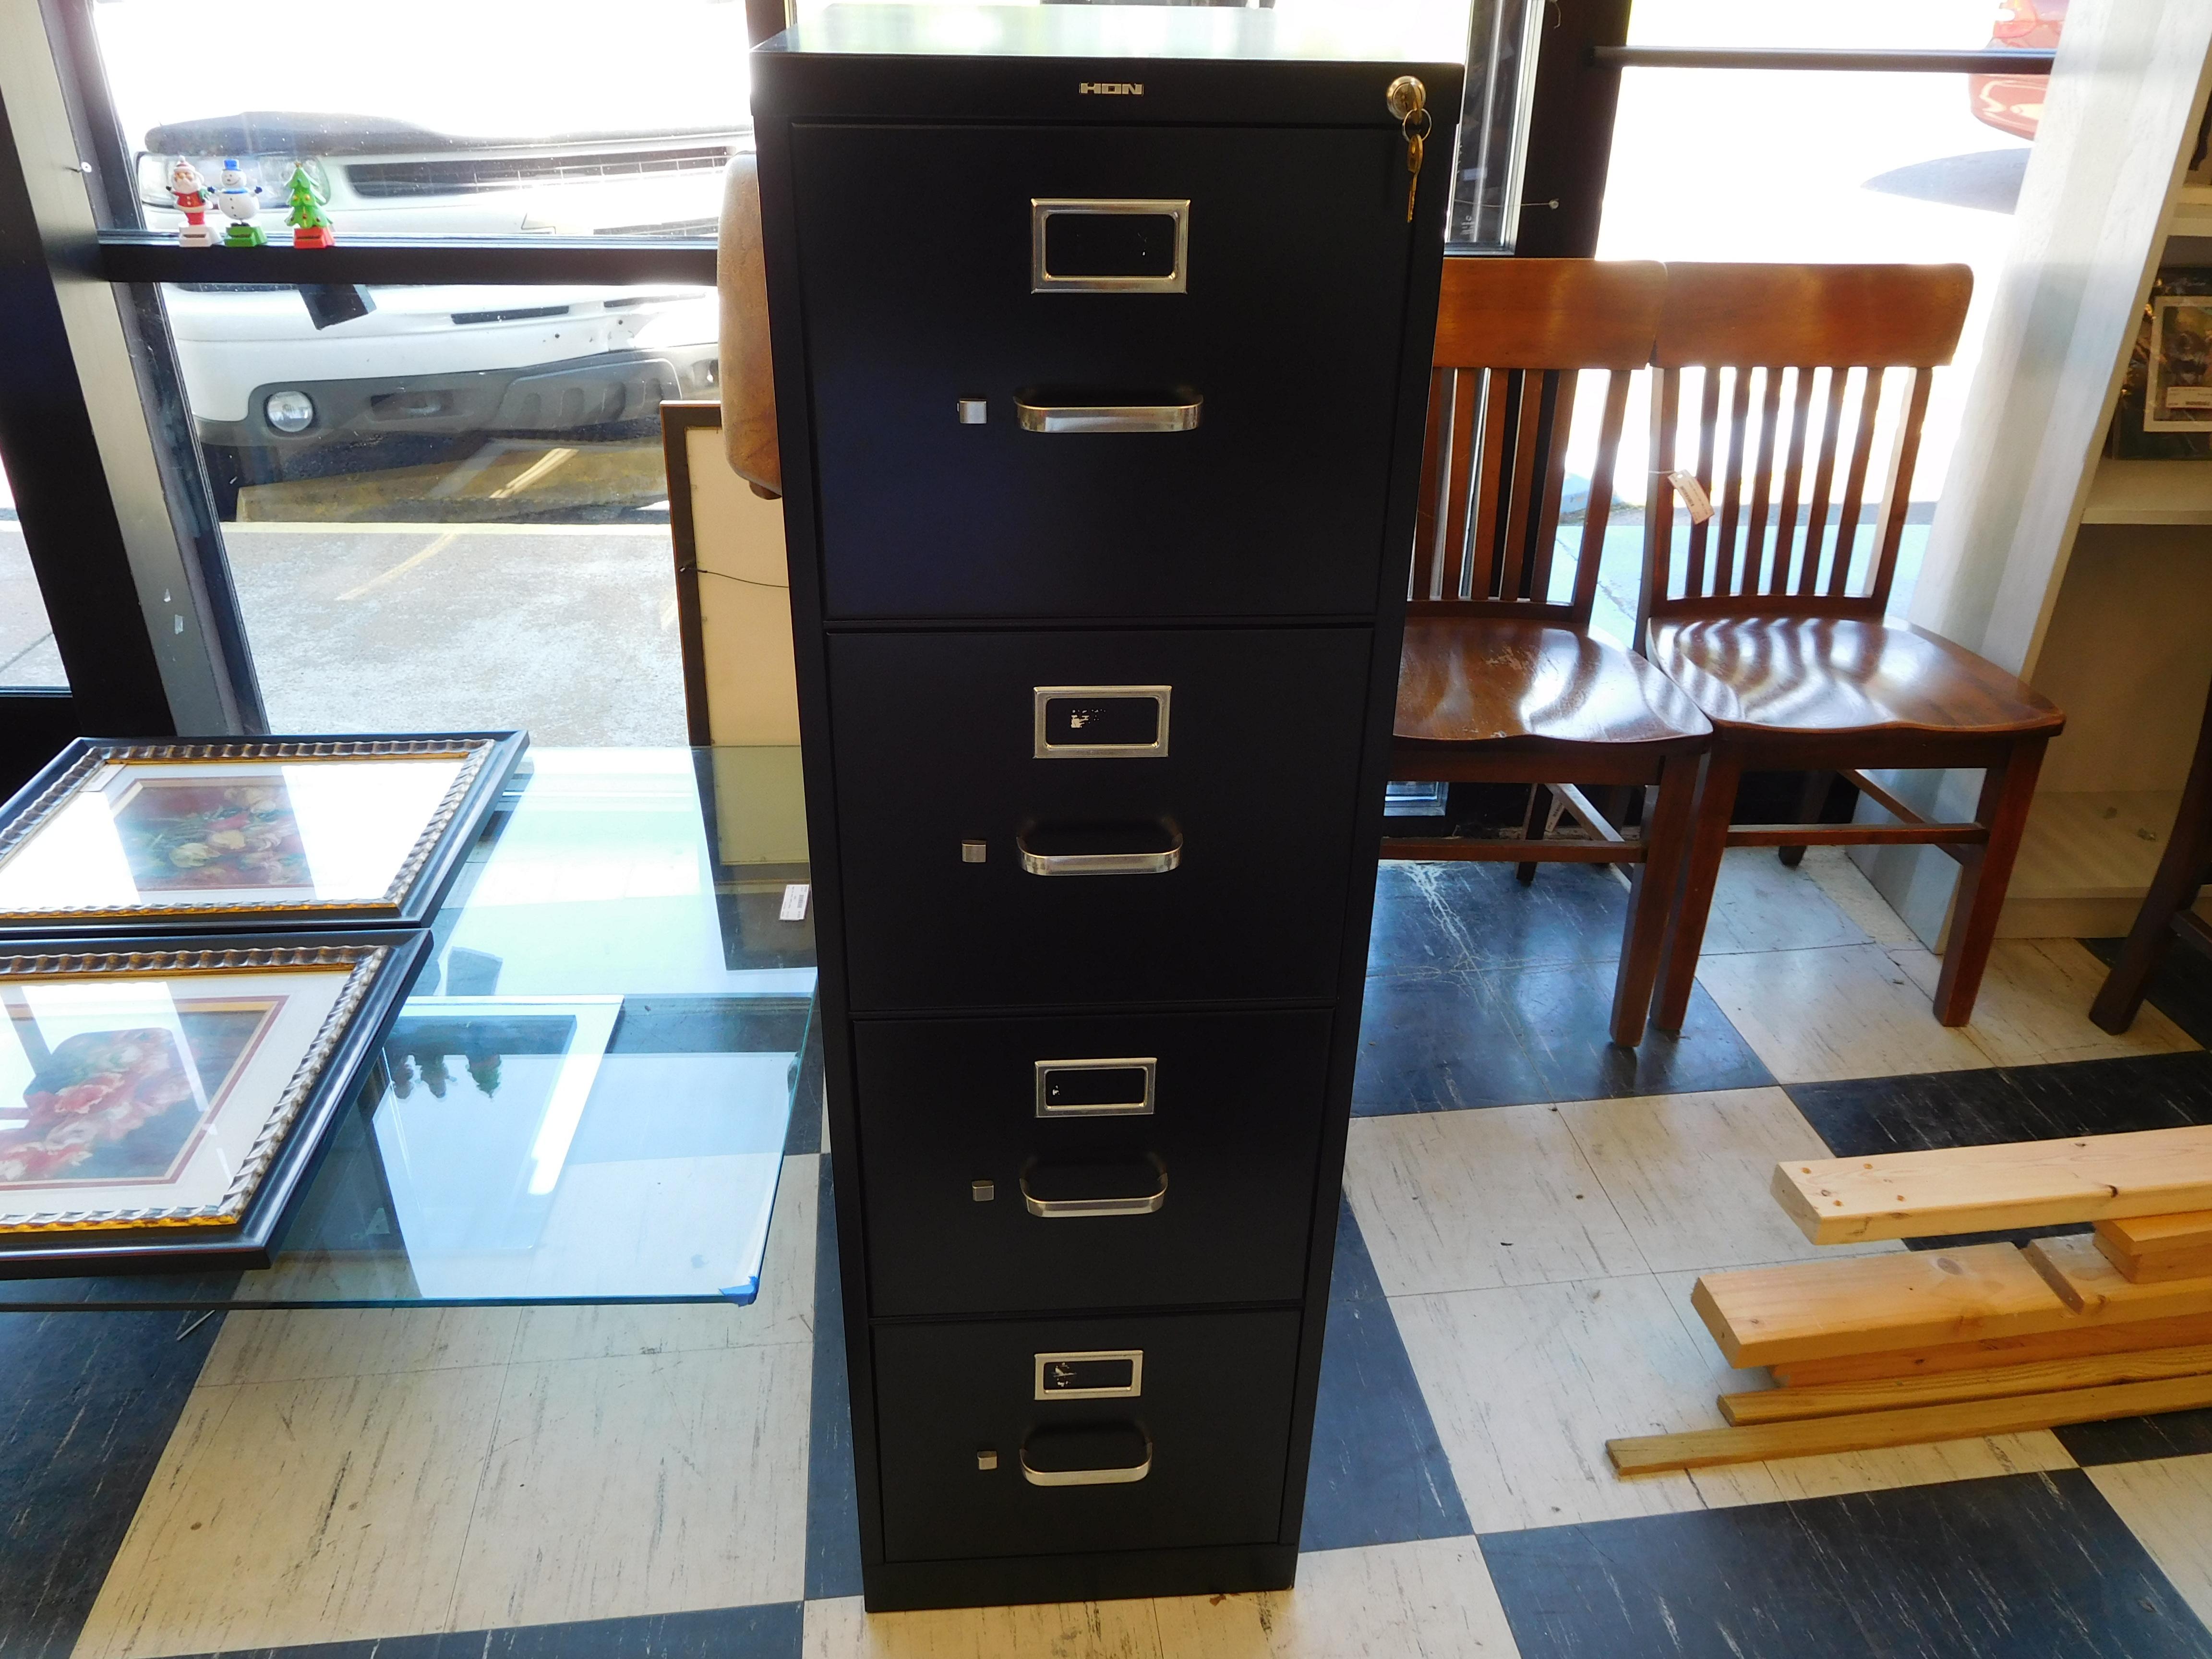 Black Hon 4-Drawer Filing Cabinet (Has Keys)